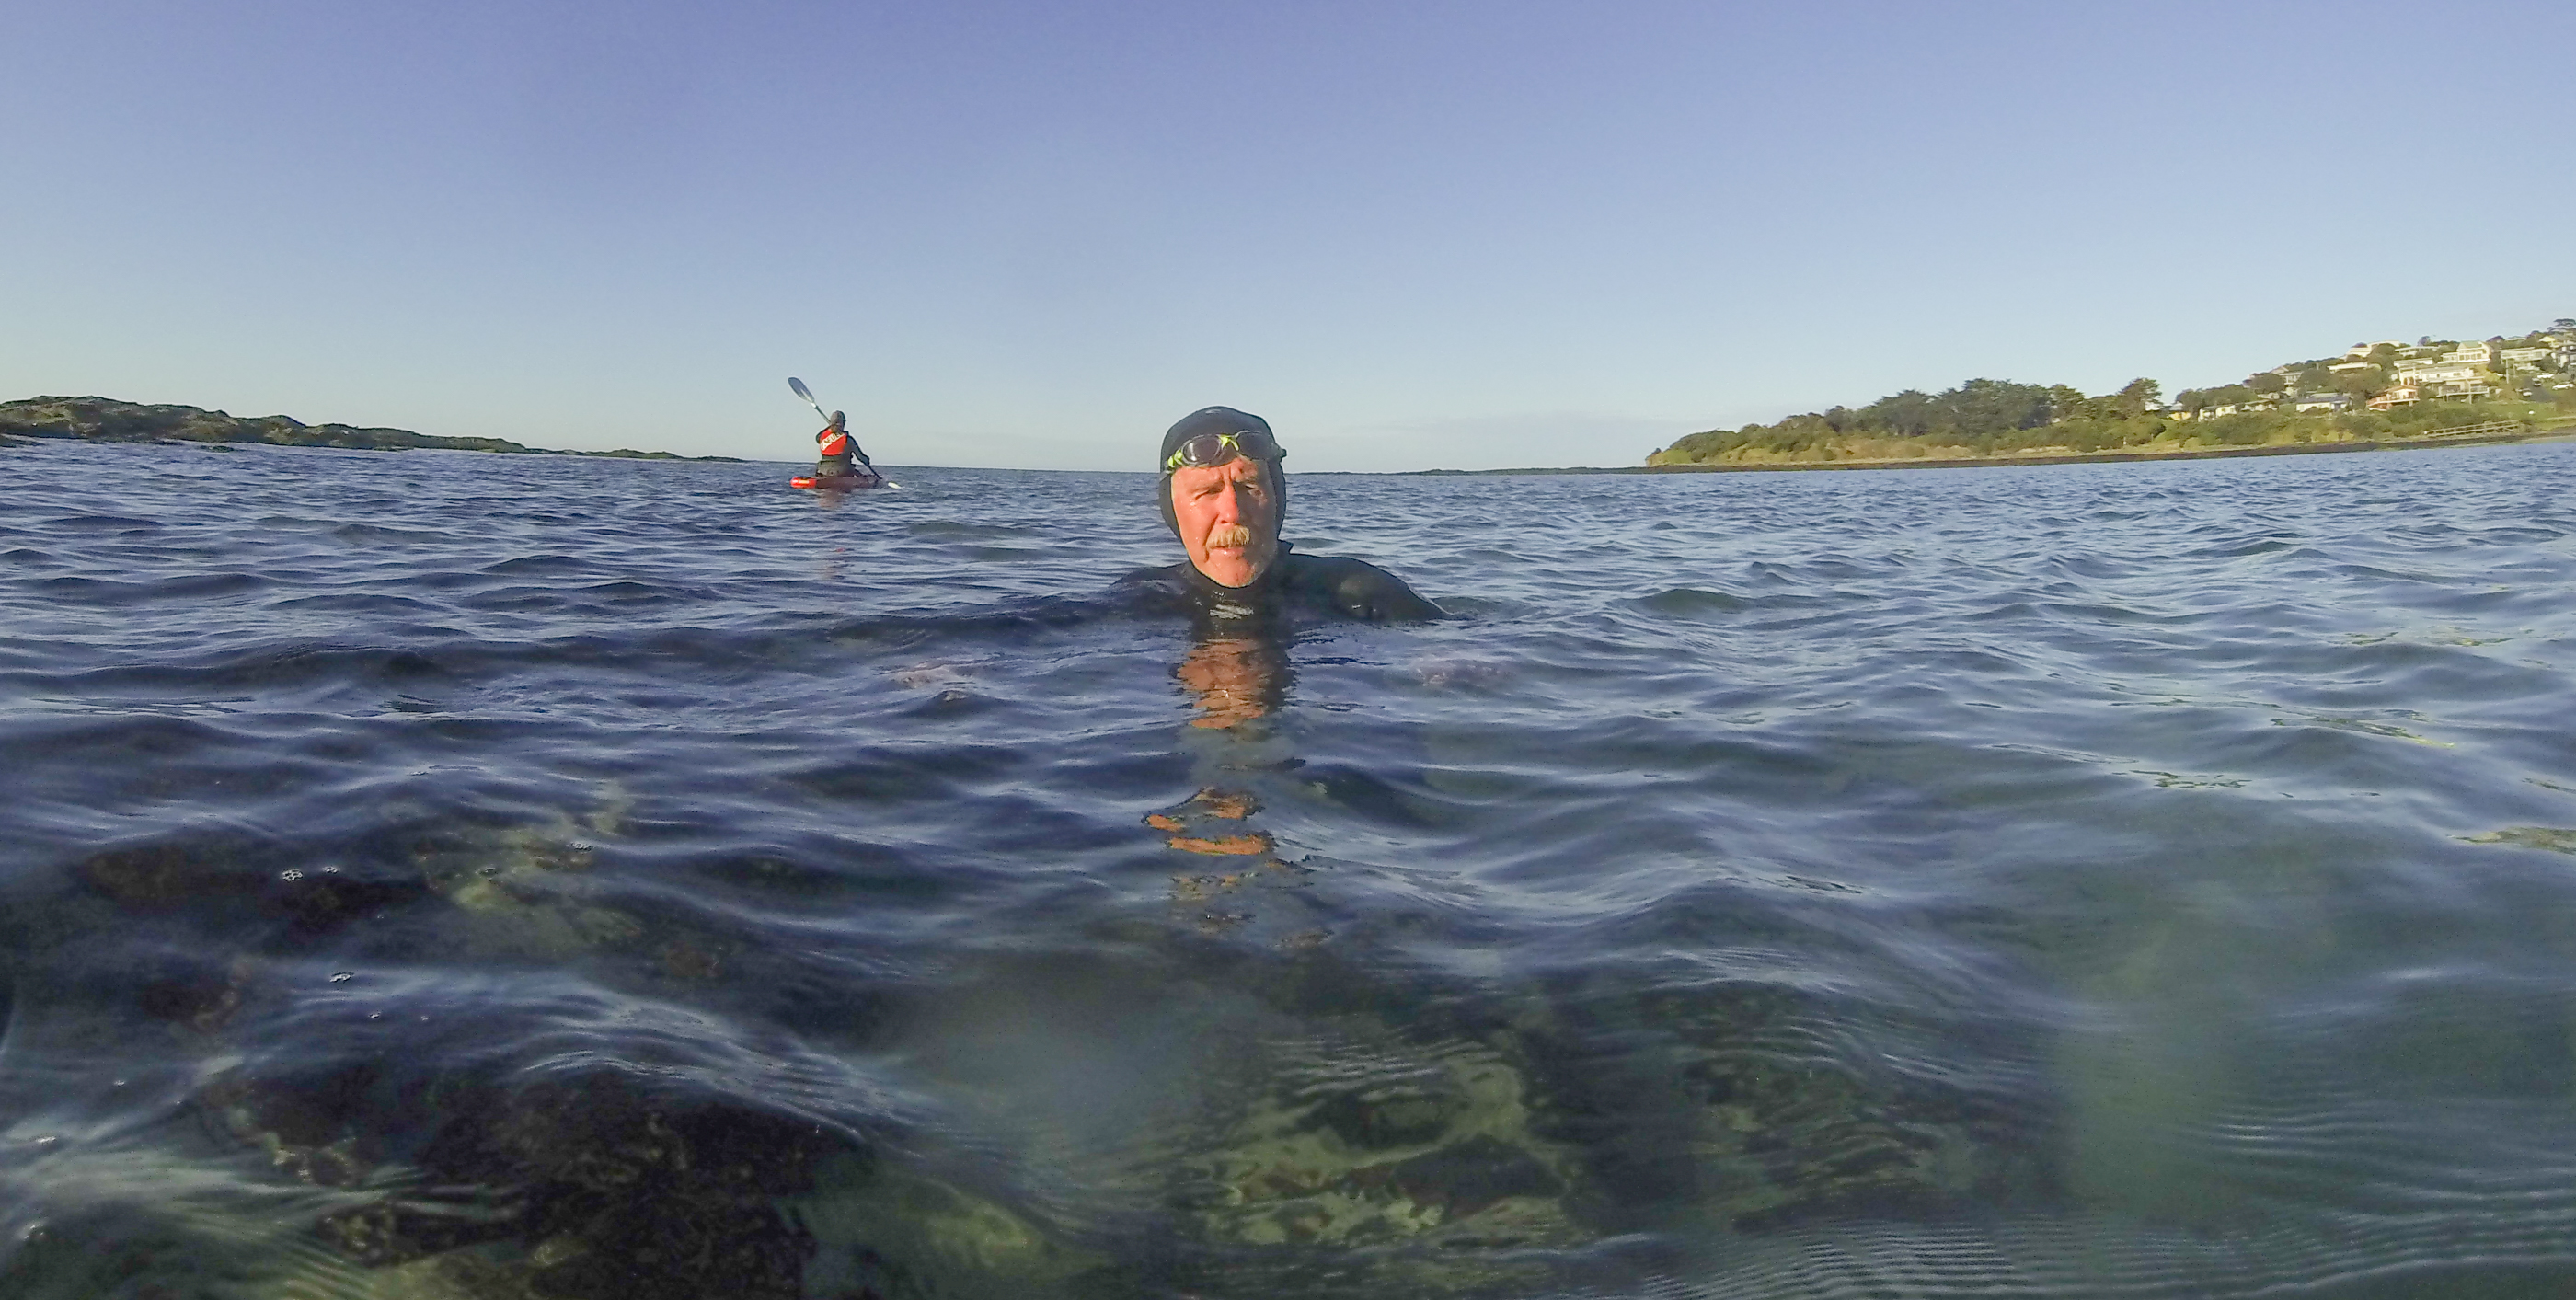 Ocean swimmers at reef at Marengo